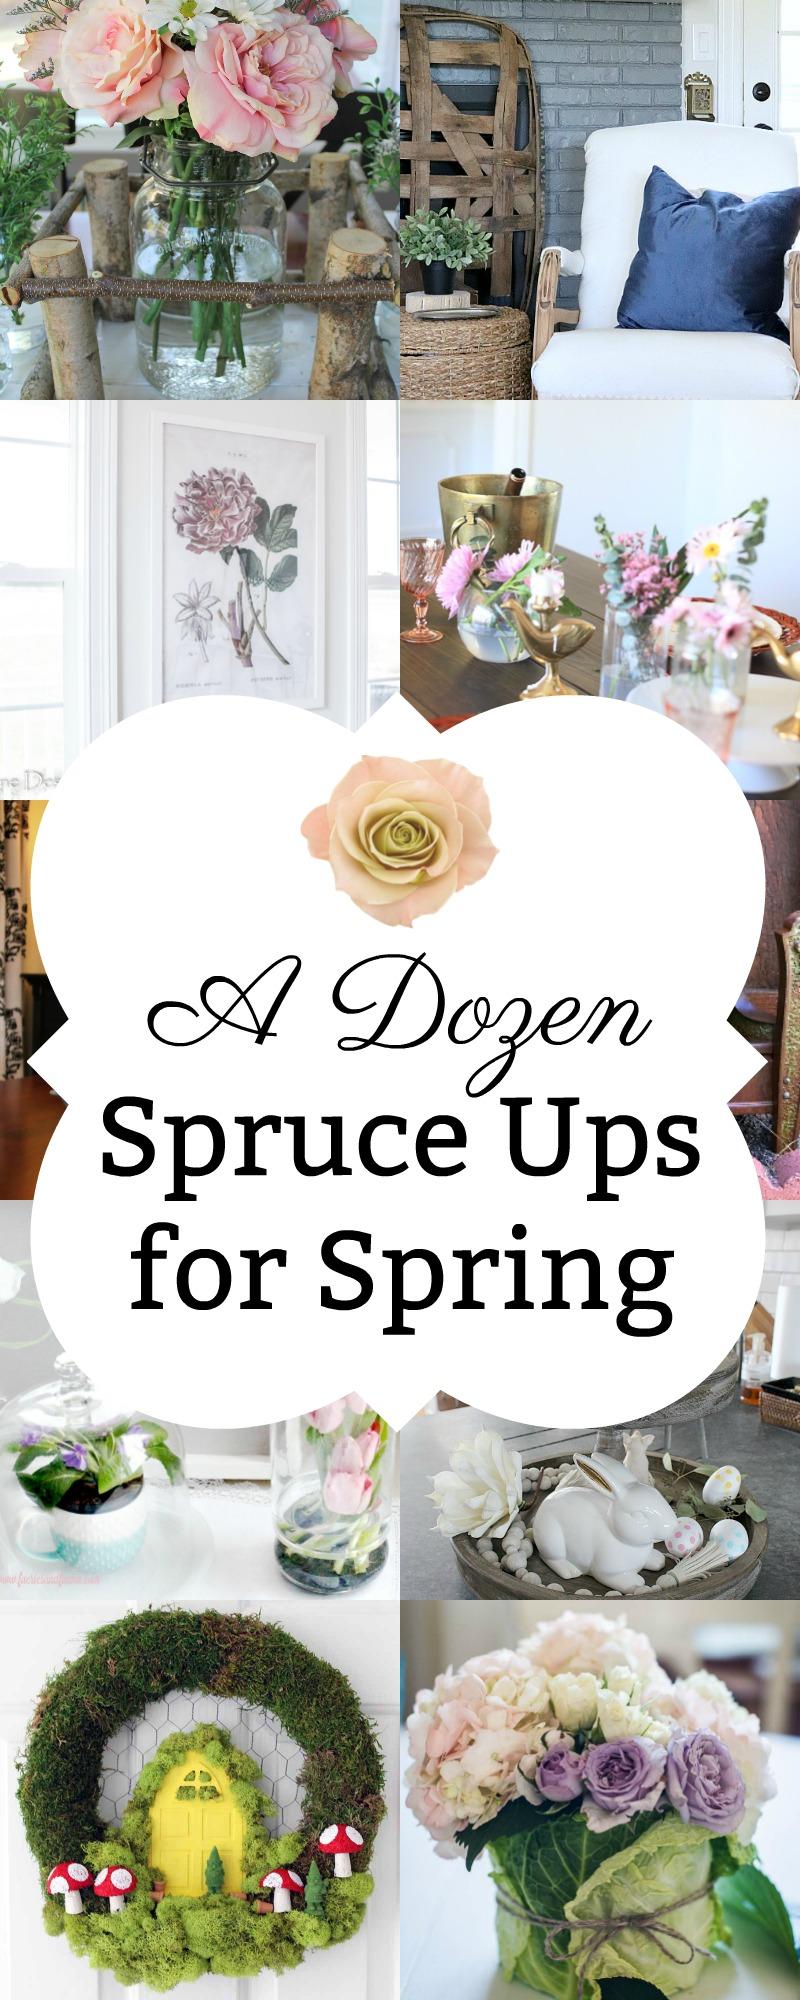 A Dozen Spruce Ups for Spring